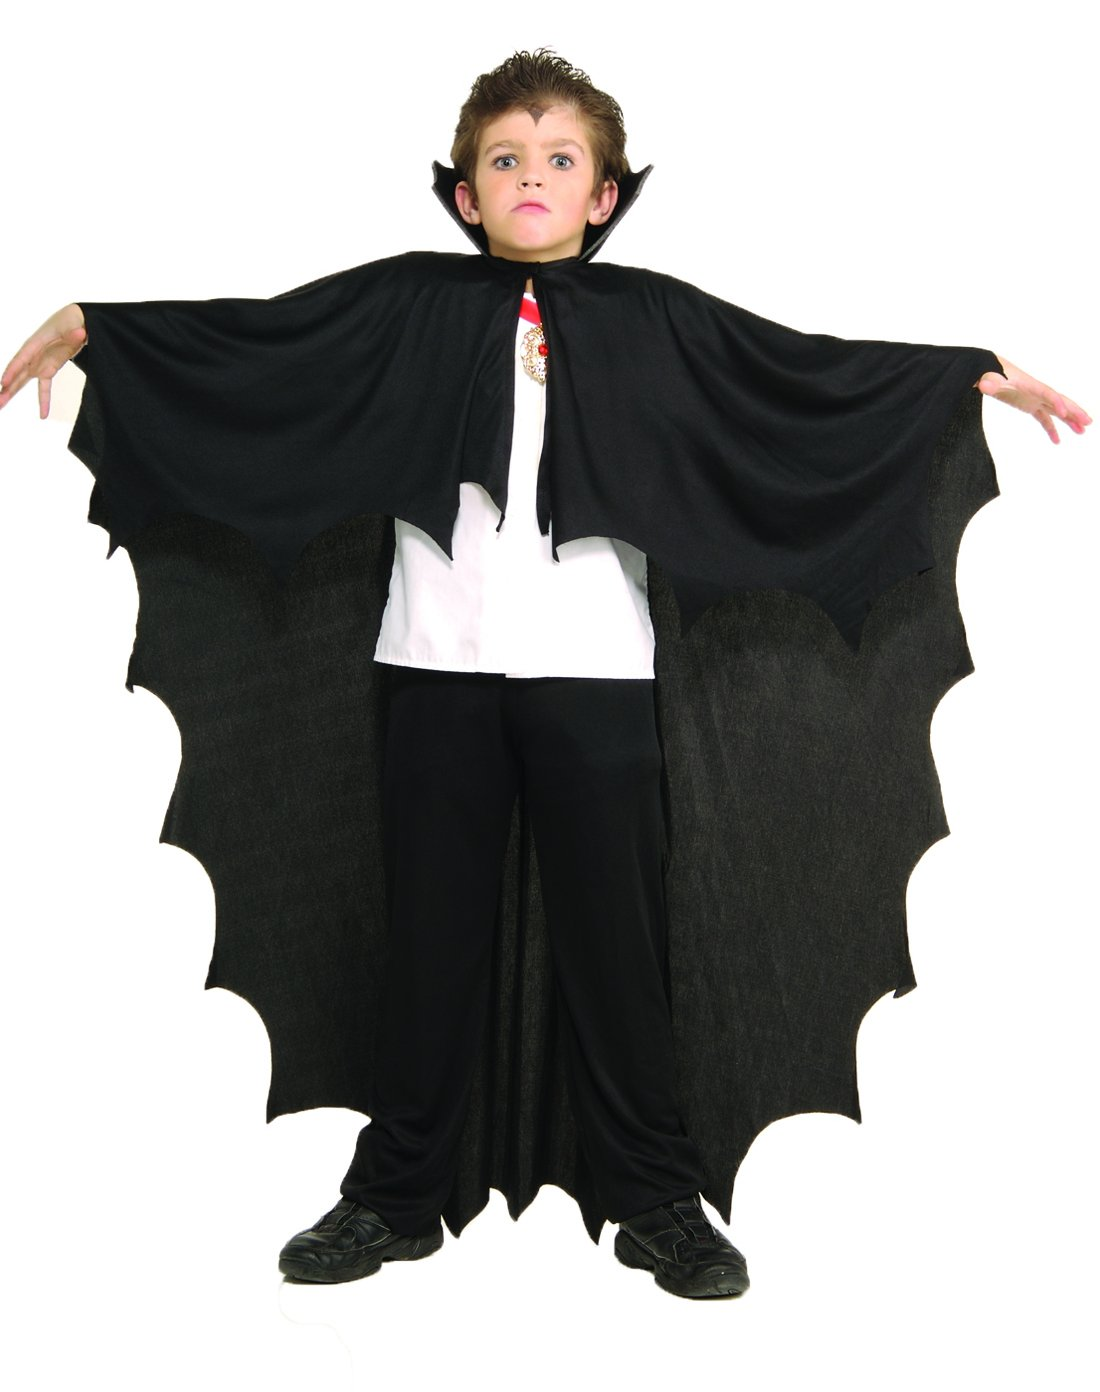 Rubie's Costume Co Vampire Cape Child Costume, Black, One Size